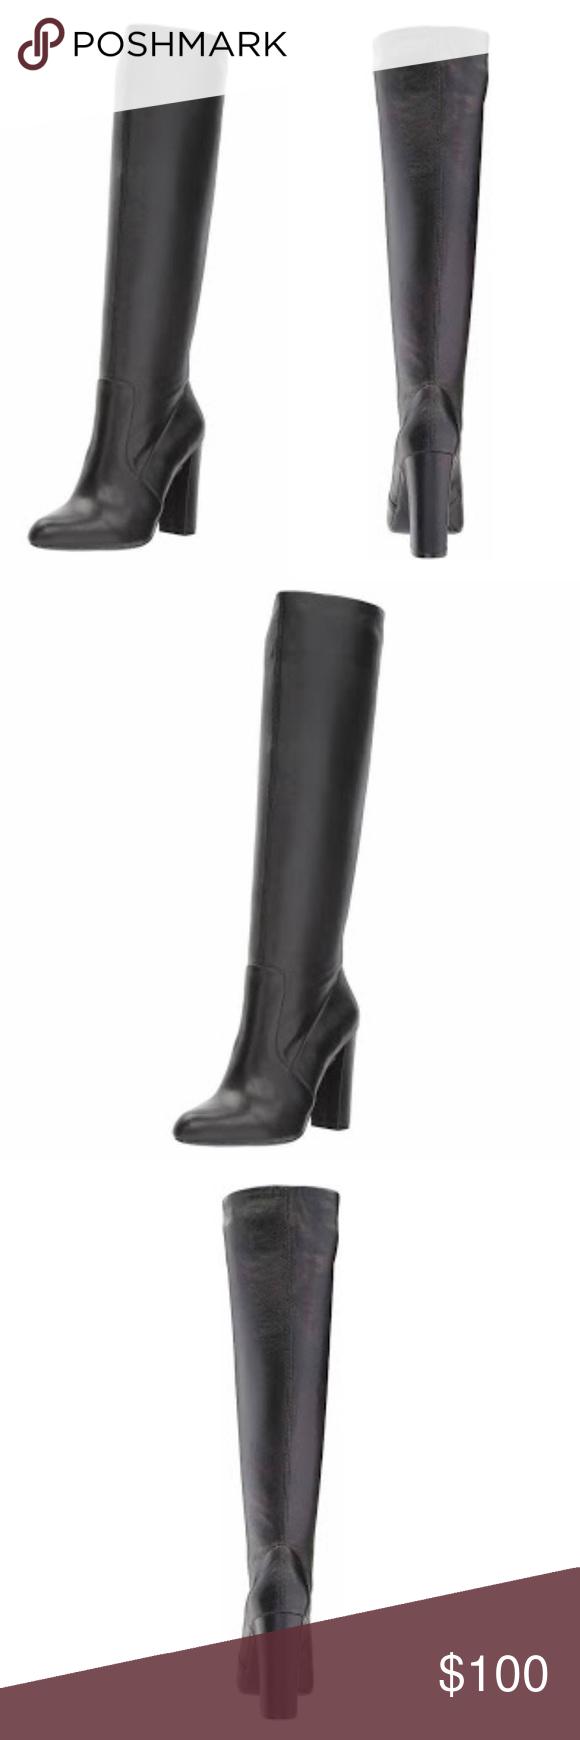 4df333f3e89 🆕STEVE MADDEN Eton Block Heel Leather Boots New without the box Steve  Madden Eton style